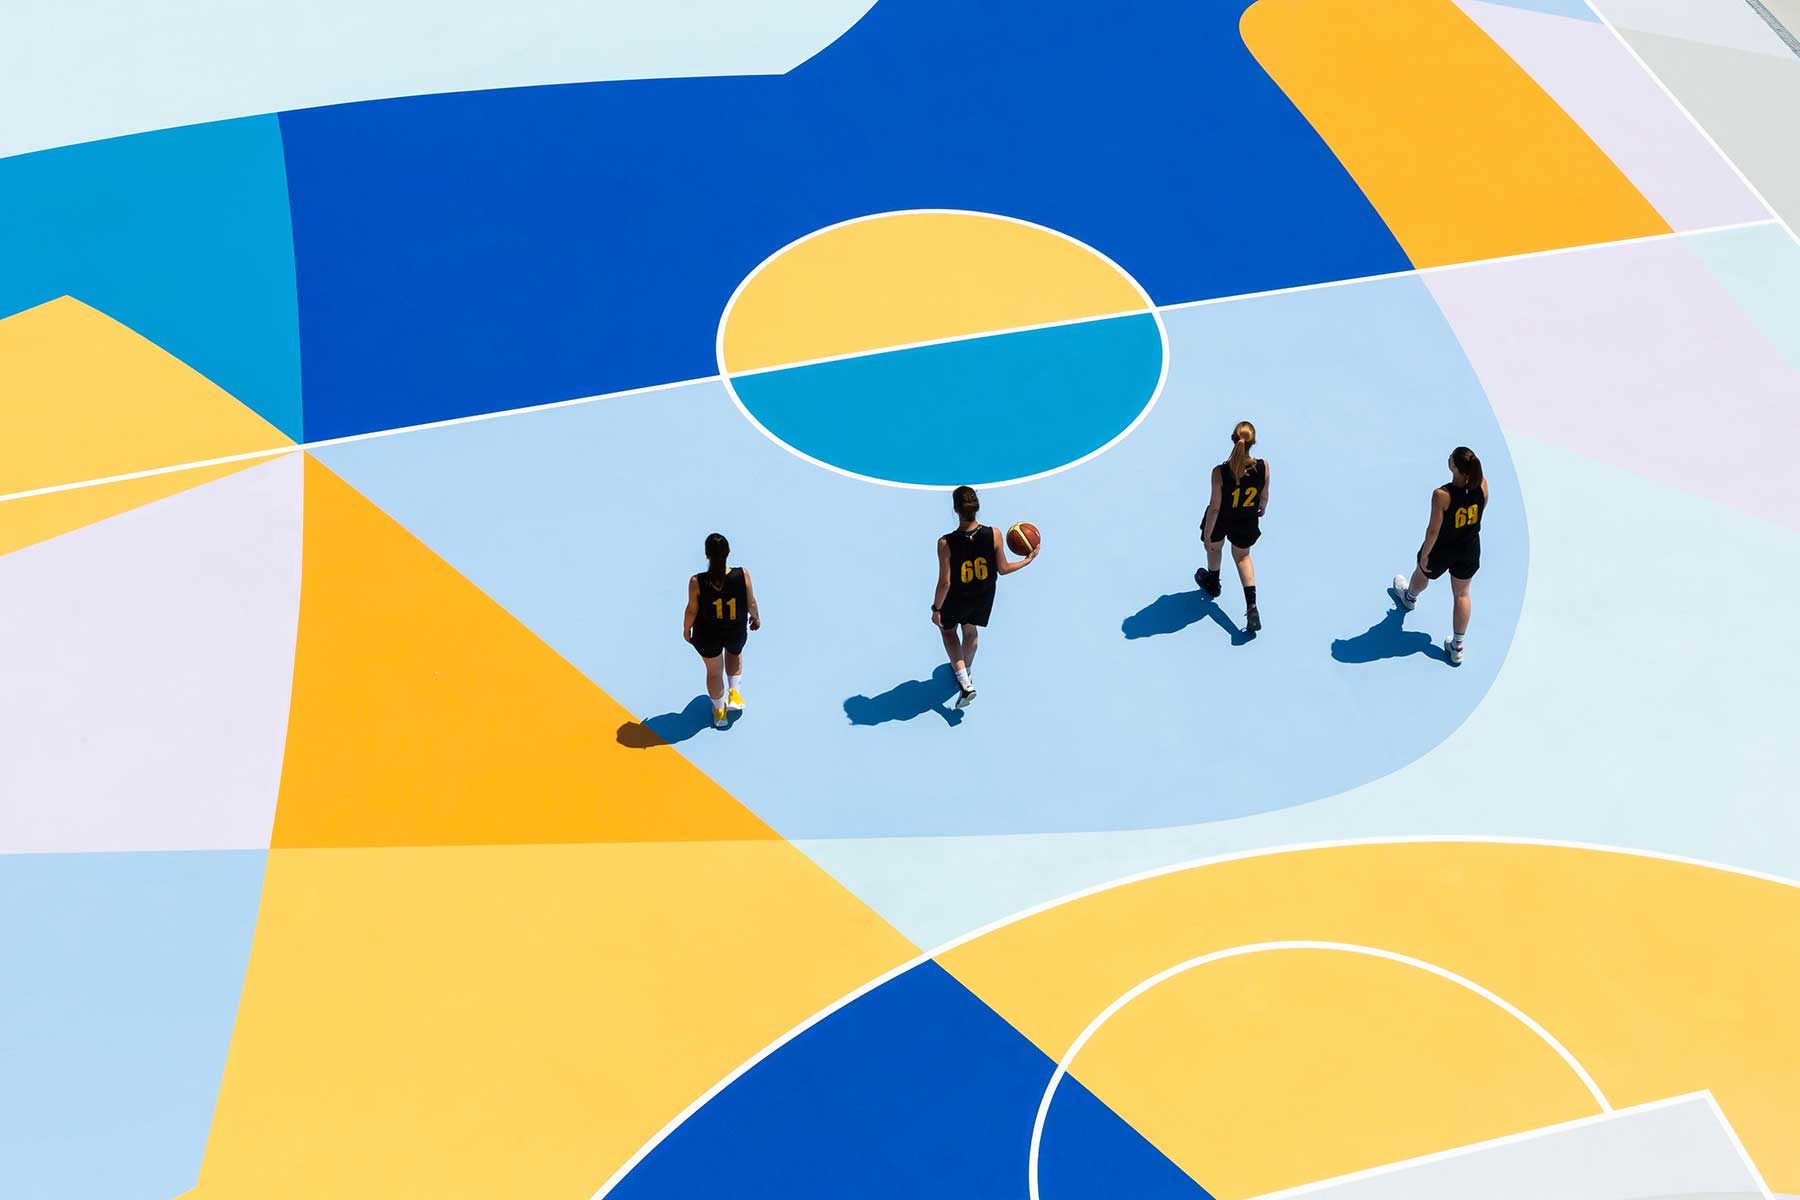 Farbenfrohe Basketballplätze von Gummy Gue Gummy-Gue-bunter-basketballplatz-Buccinasco_07